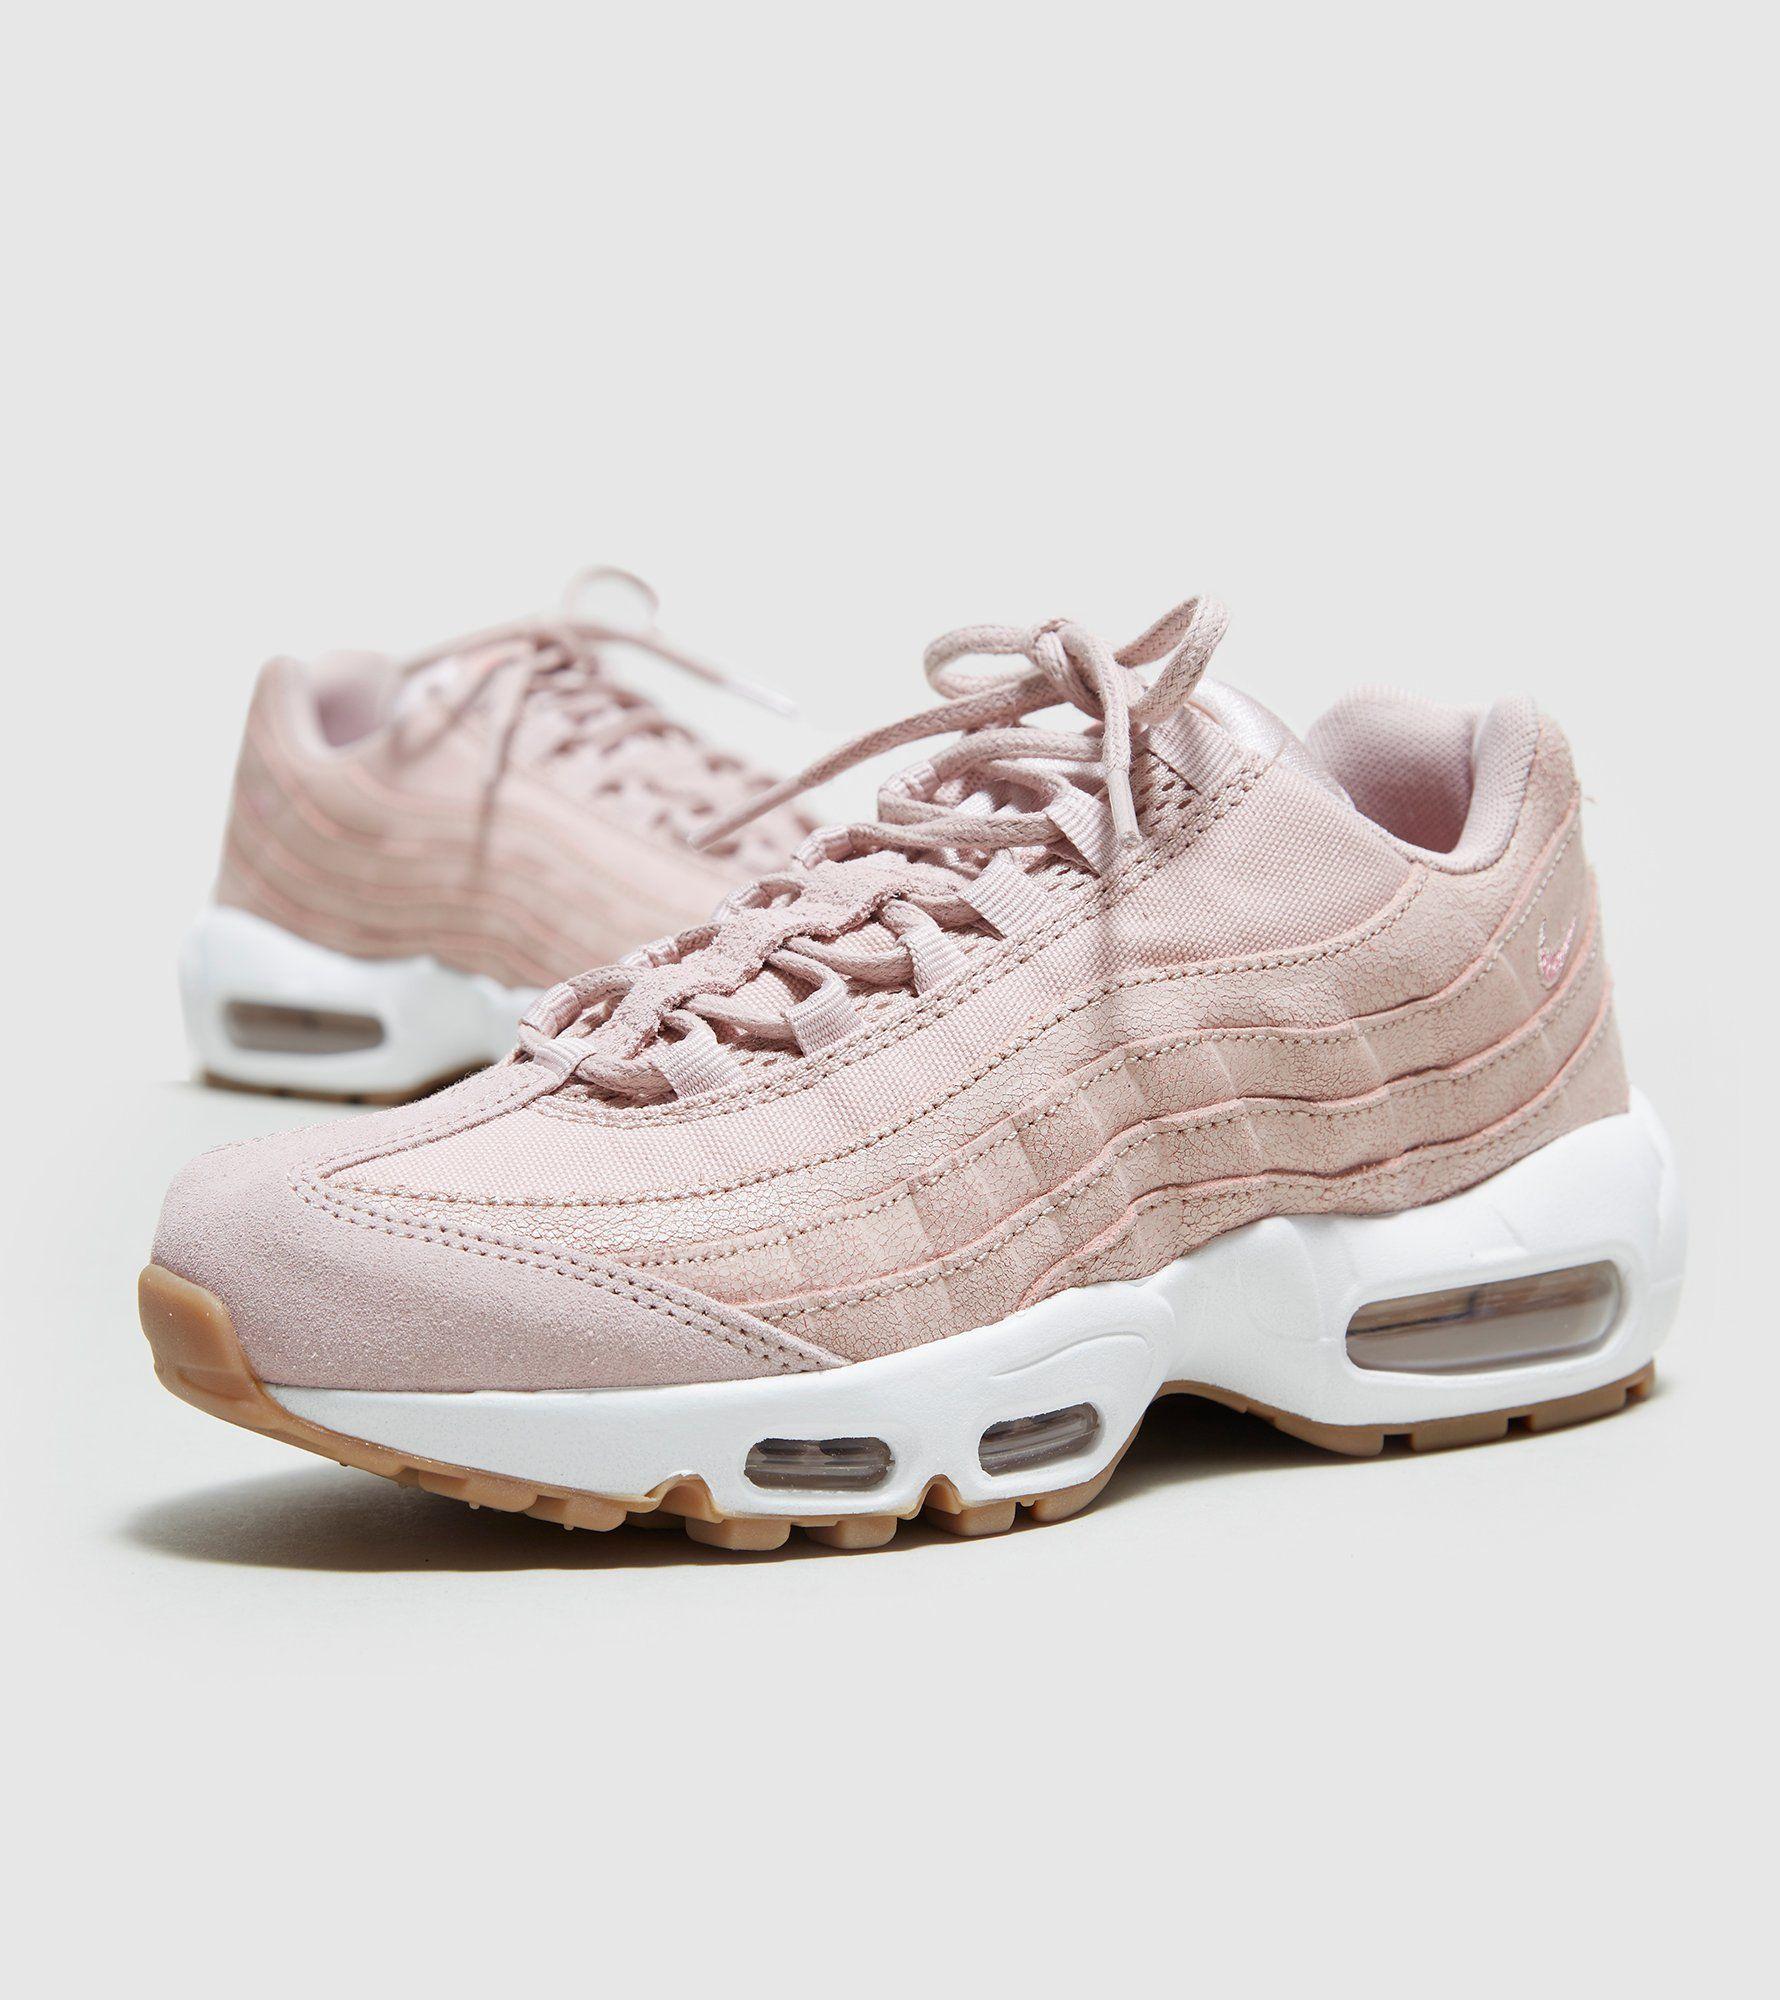 nike air max 95 ladies pink